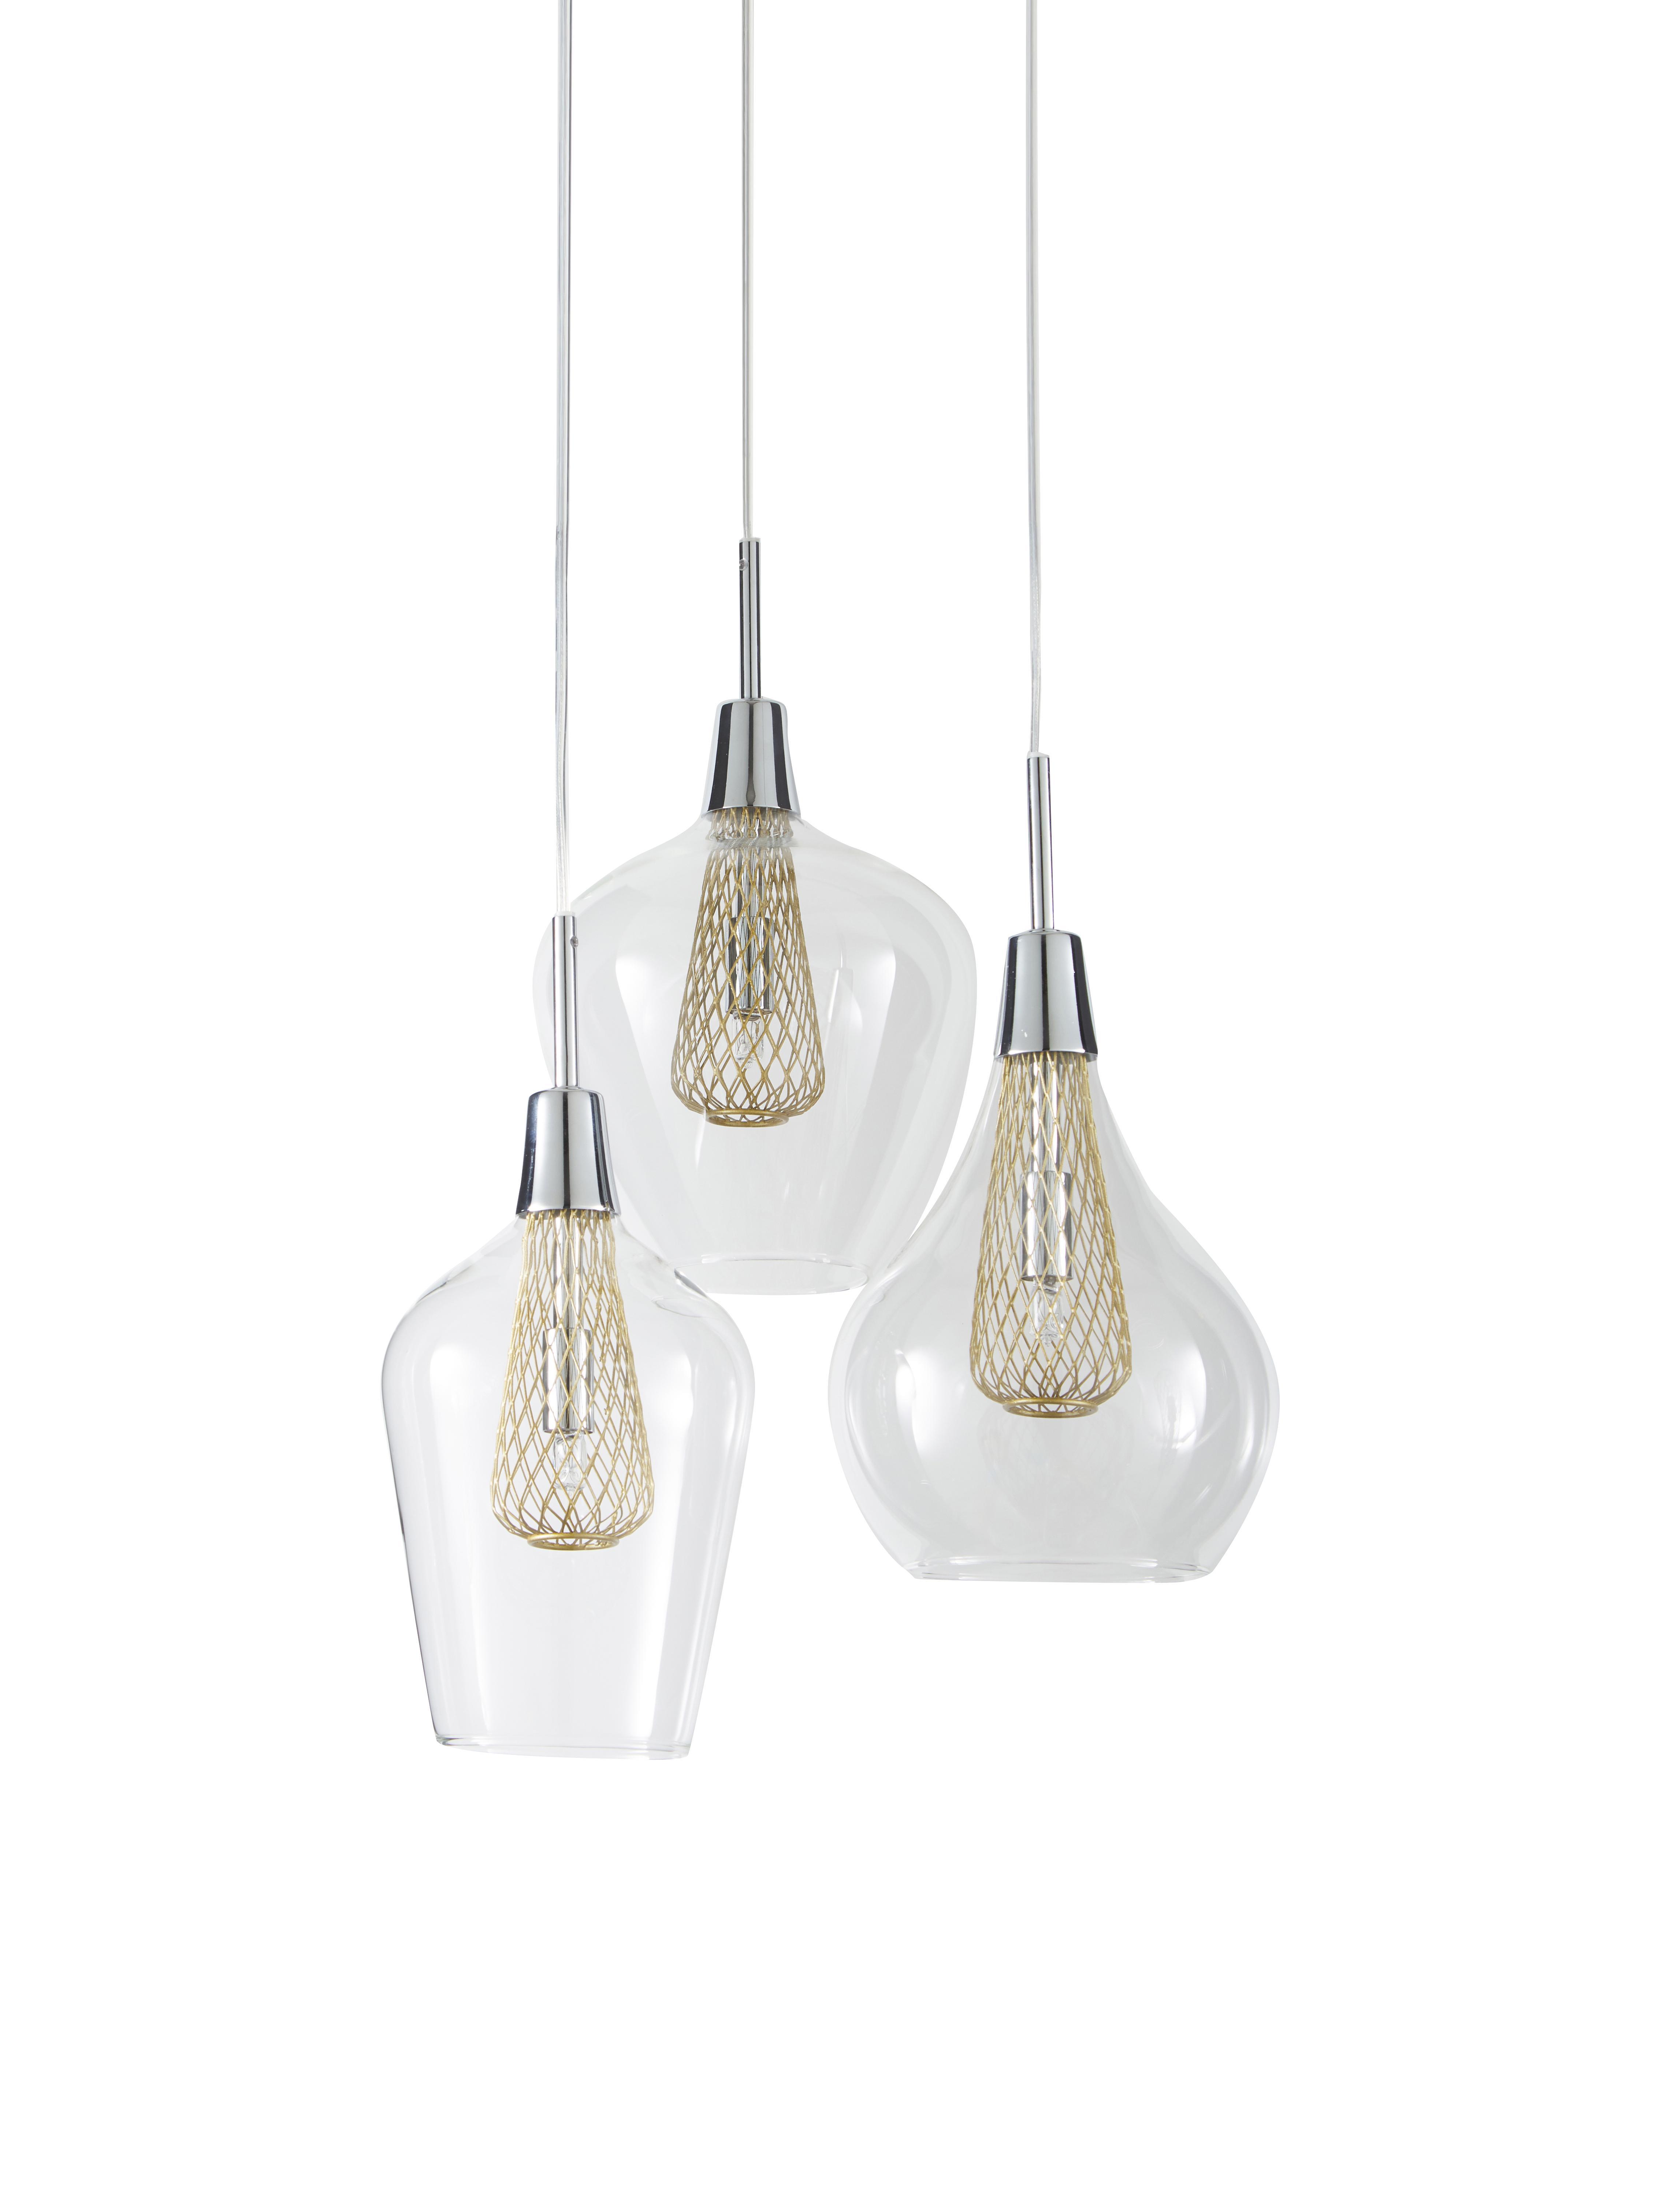 Hanglamp Filo, Transparant, messingkleurig, Ø 36 x H 120 cm